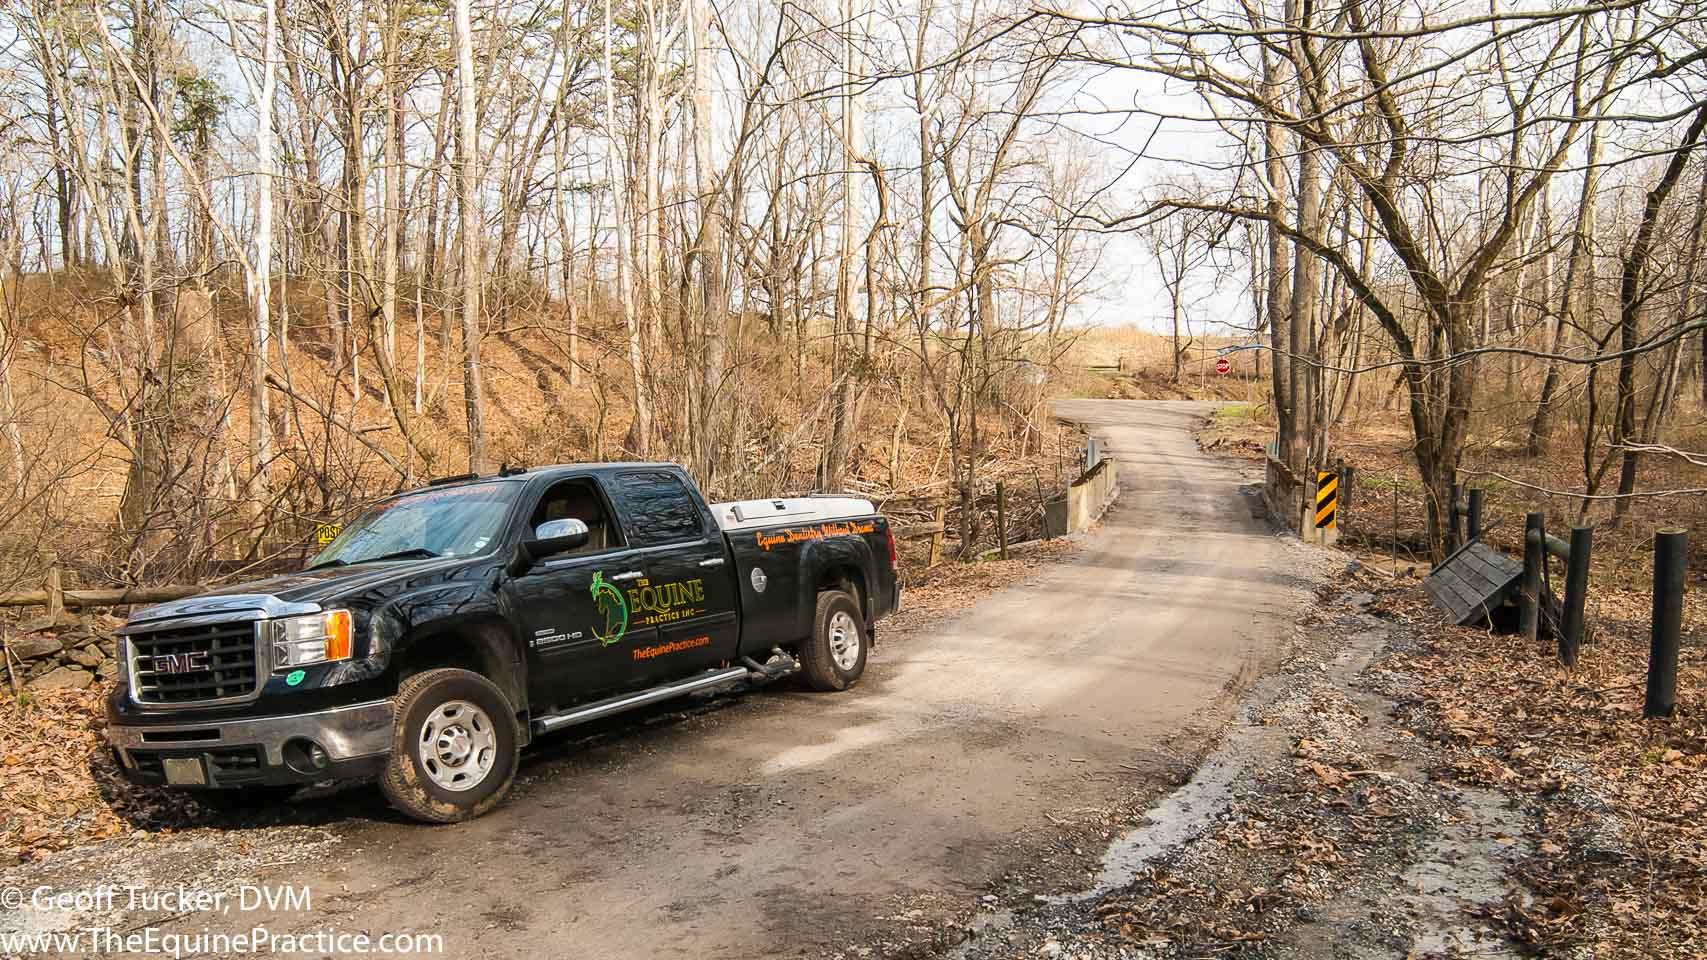 BP_Truck-110318-7201